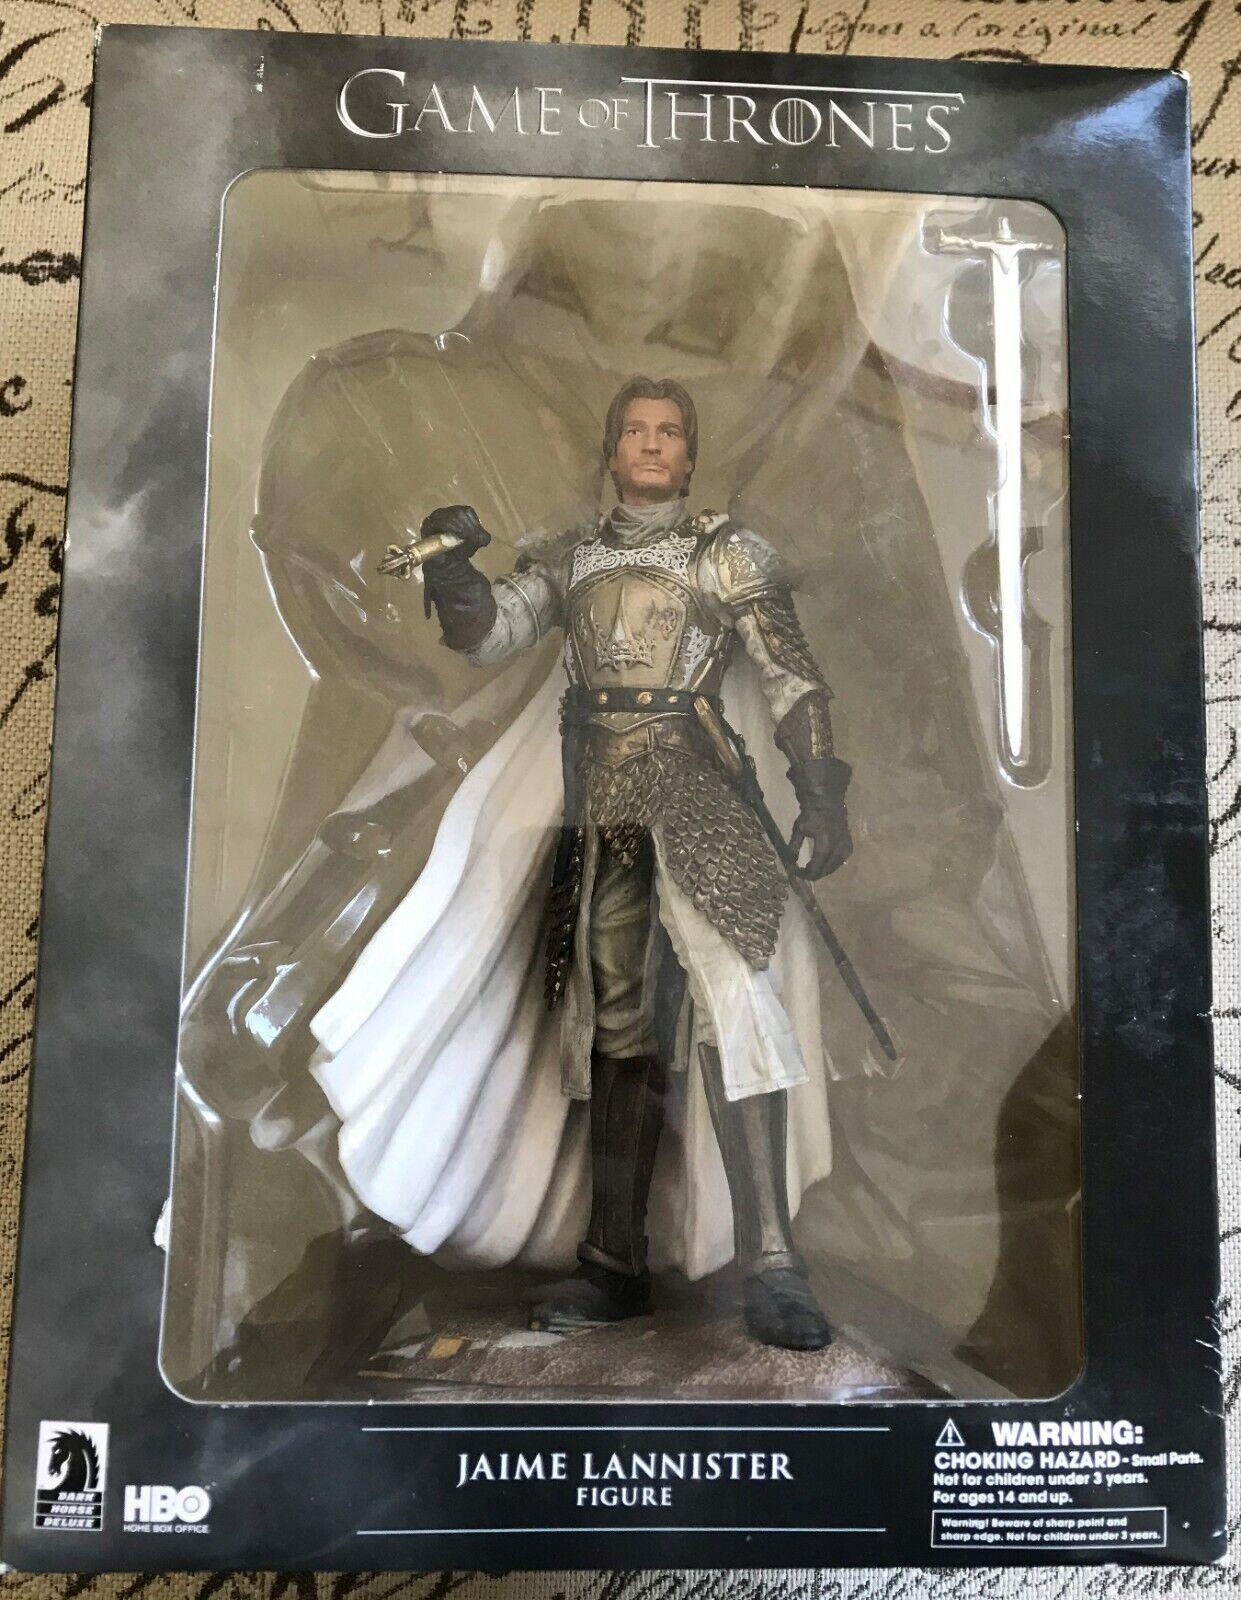 Game of Thrones - Jaime Lannister Dark Horse Deluxe HBO Figure Statue